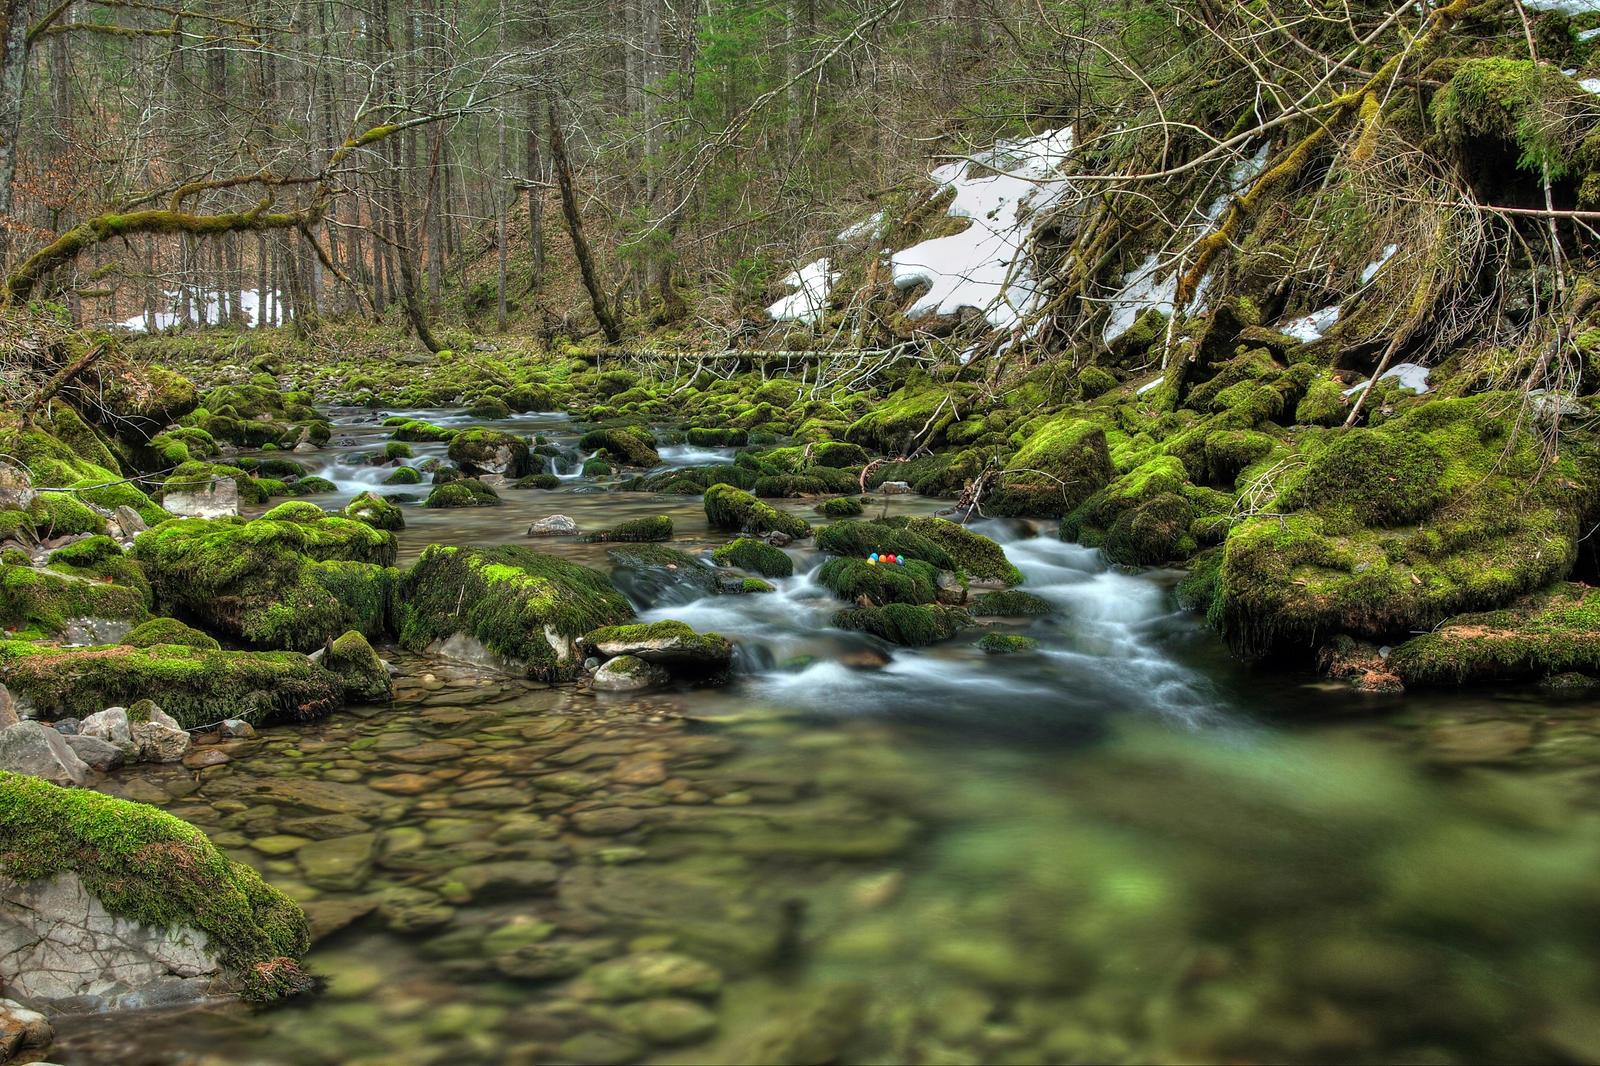 Easter Creek Background by Burtn